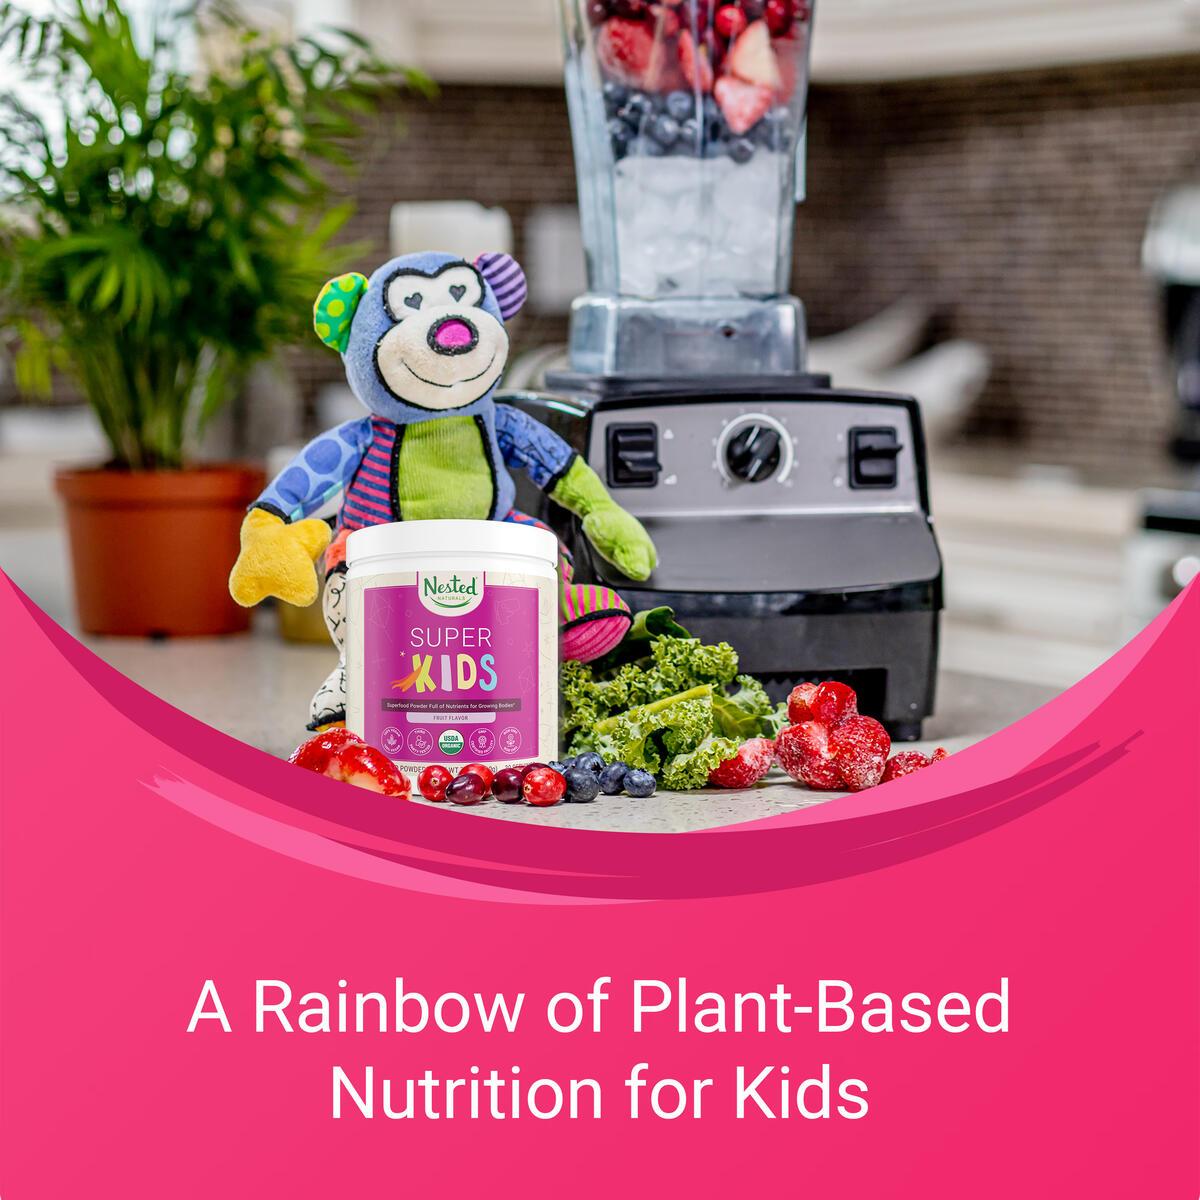 Nested Naturals Super Kids   100% USDA Organic Vegan Superfood Powder for Kids